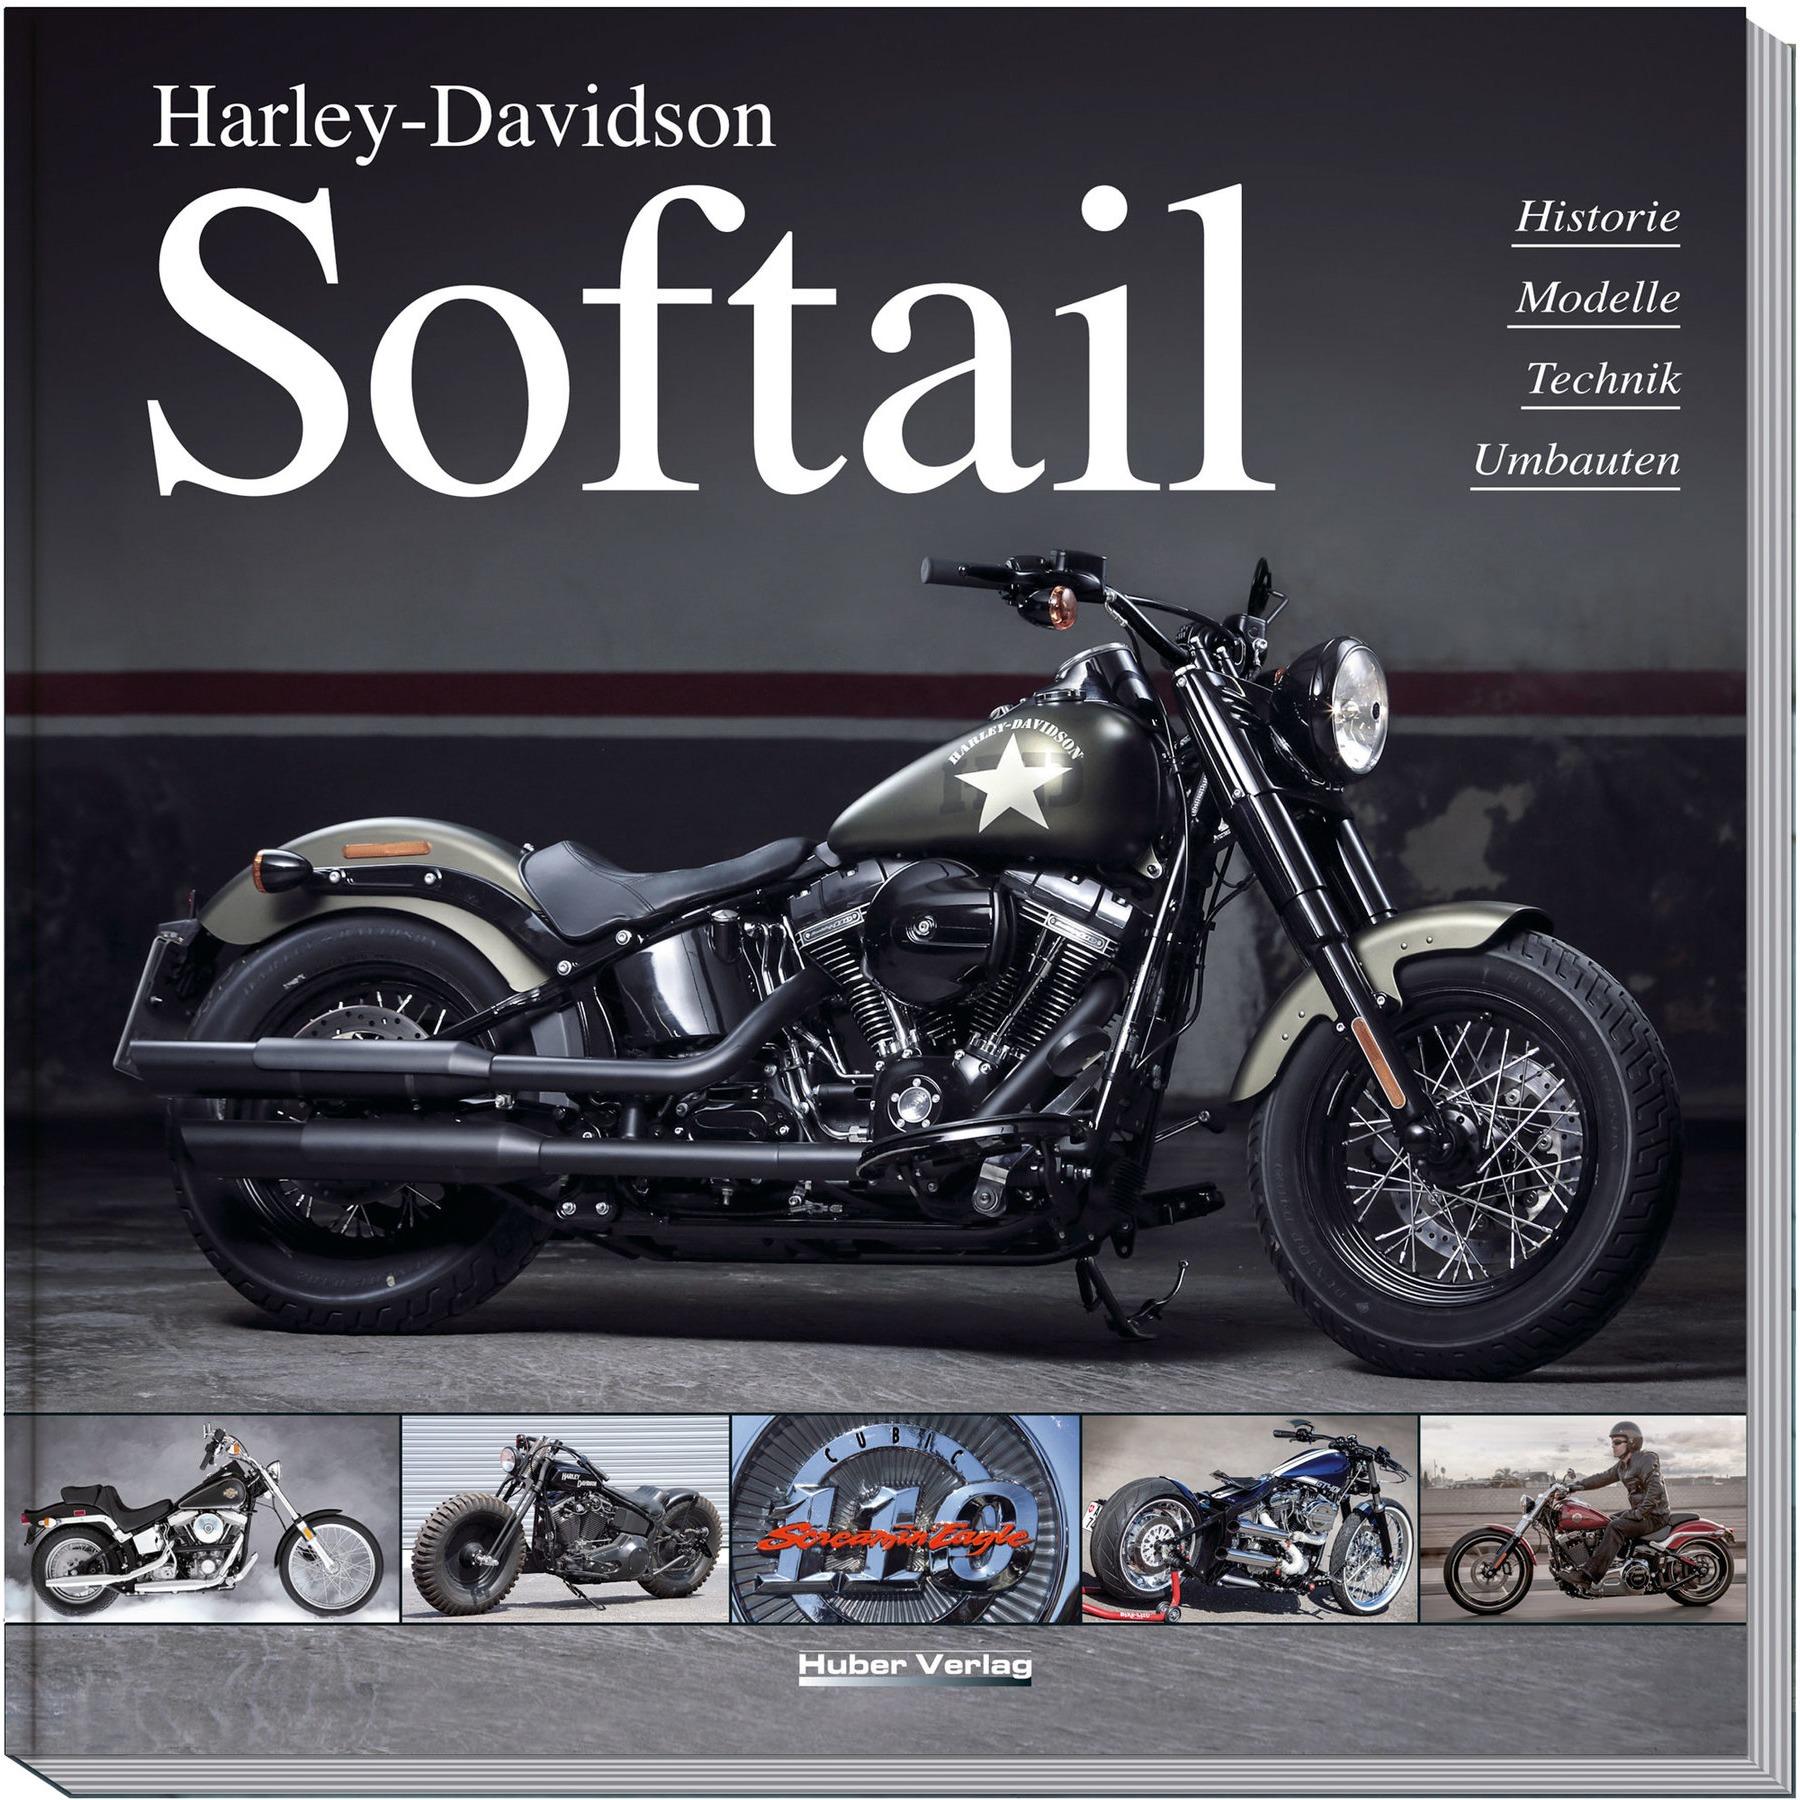 Heritage, Custom, Fat Boy, Deluxe, Night Train, Springer Harley Davidson Softail Saddlebag Supports for 84